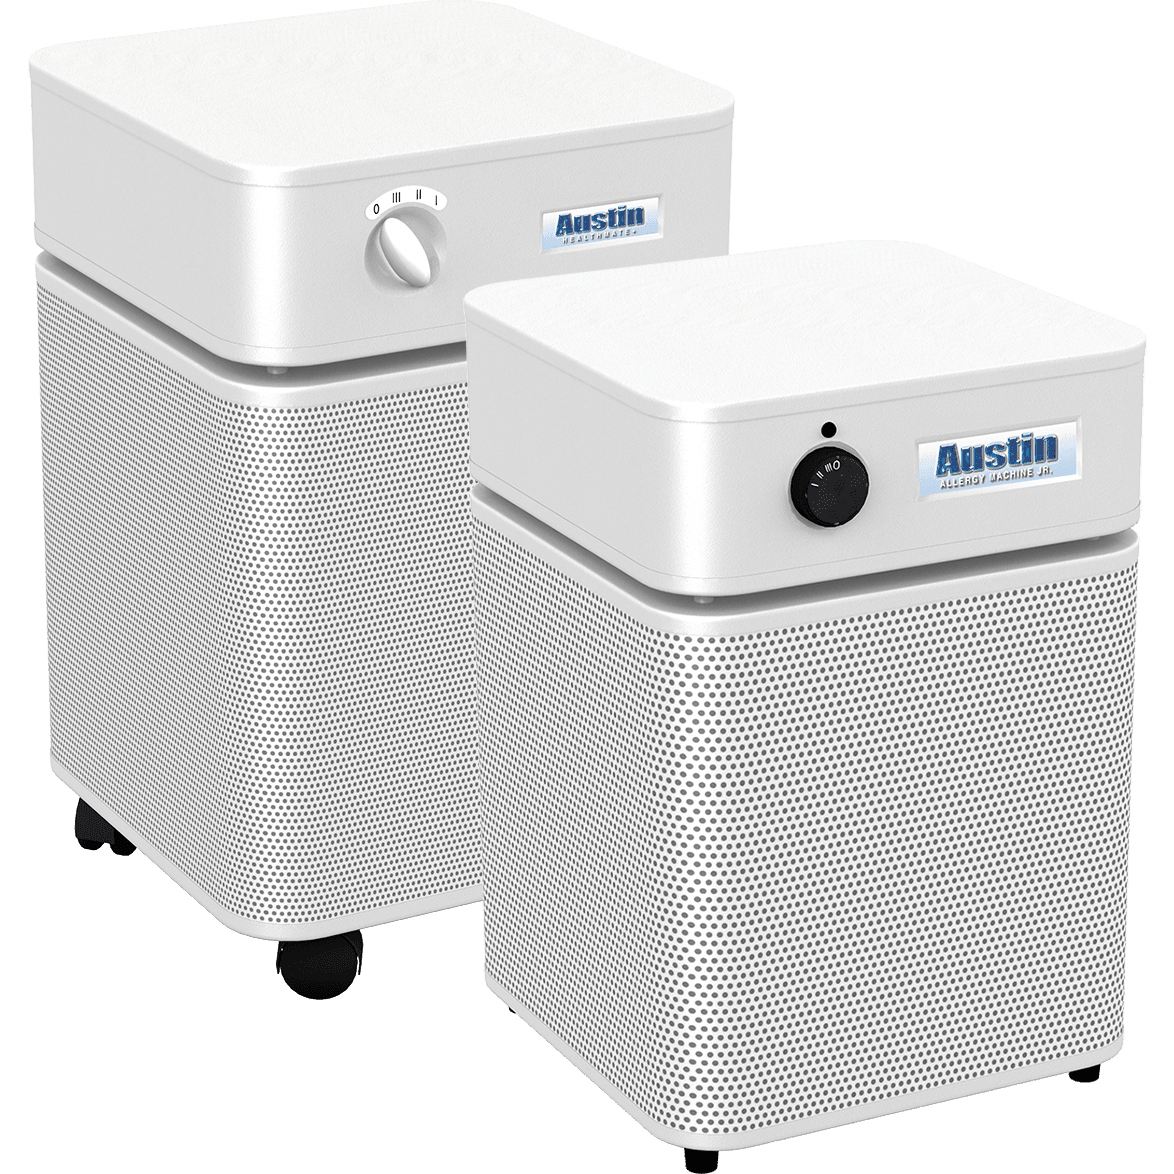 Air Purifiers For Allergies ~ Austin air allergy machine free shipping sylvane